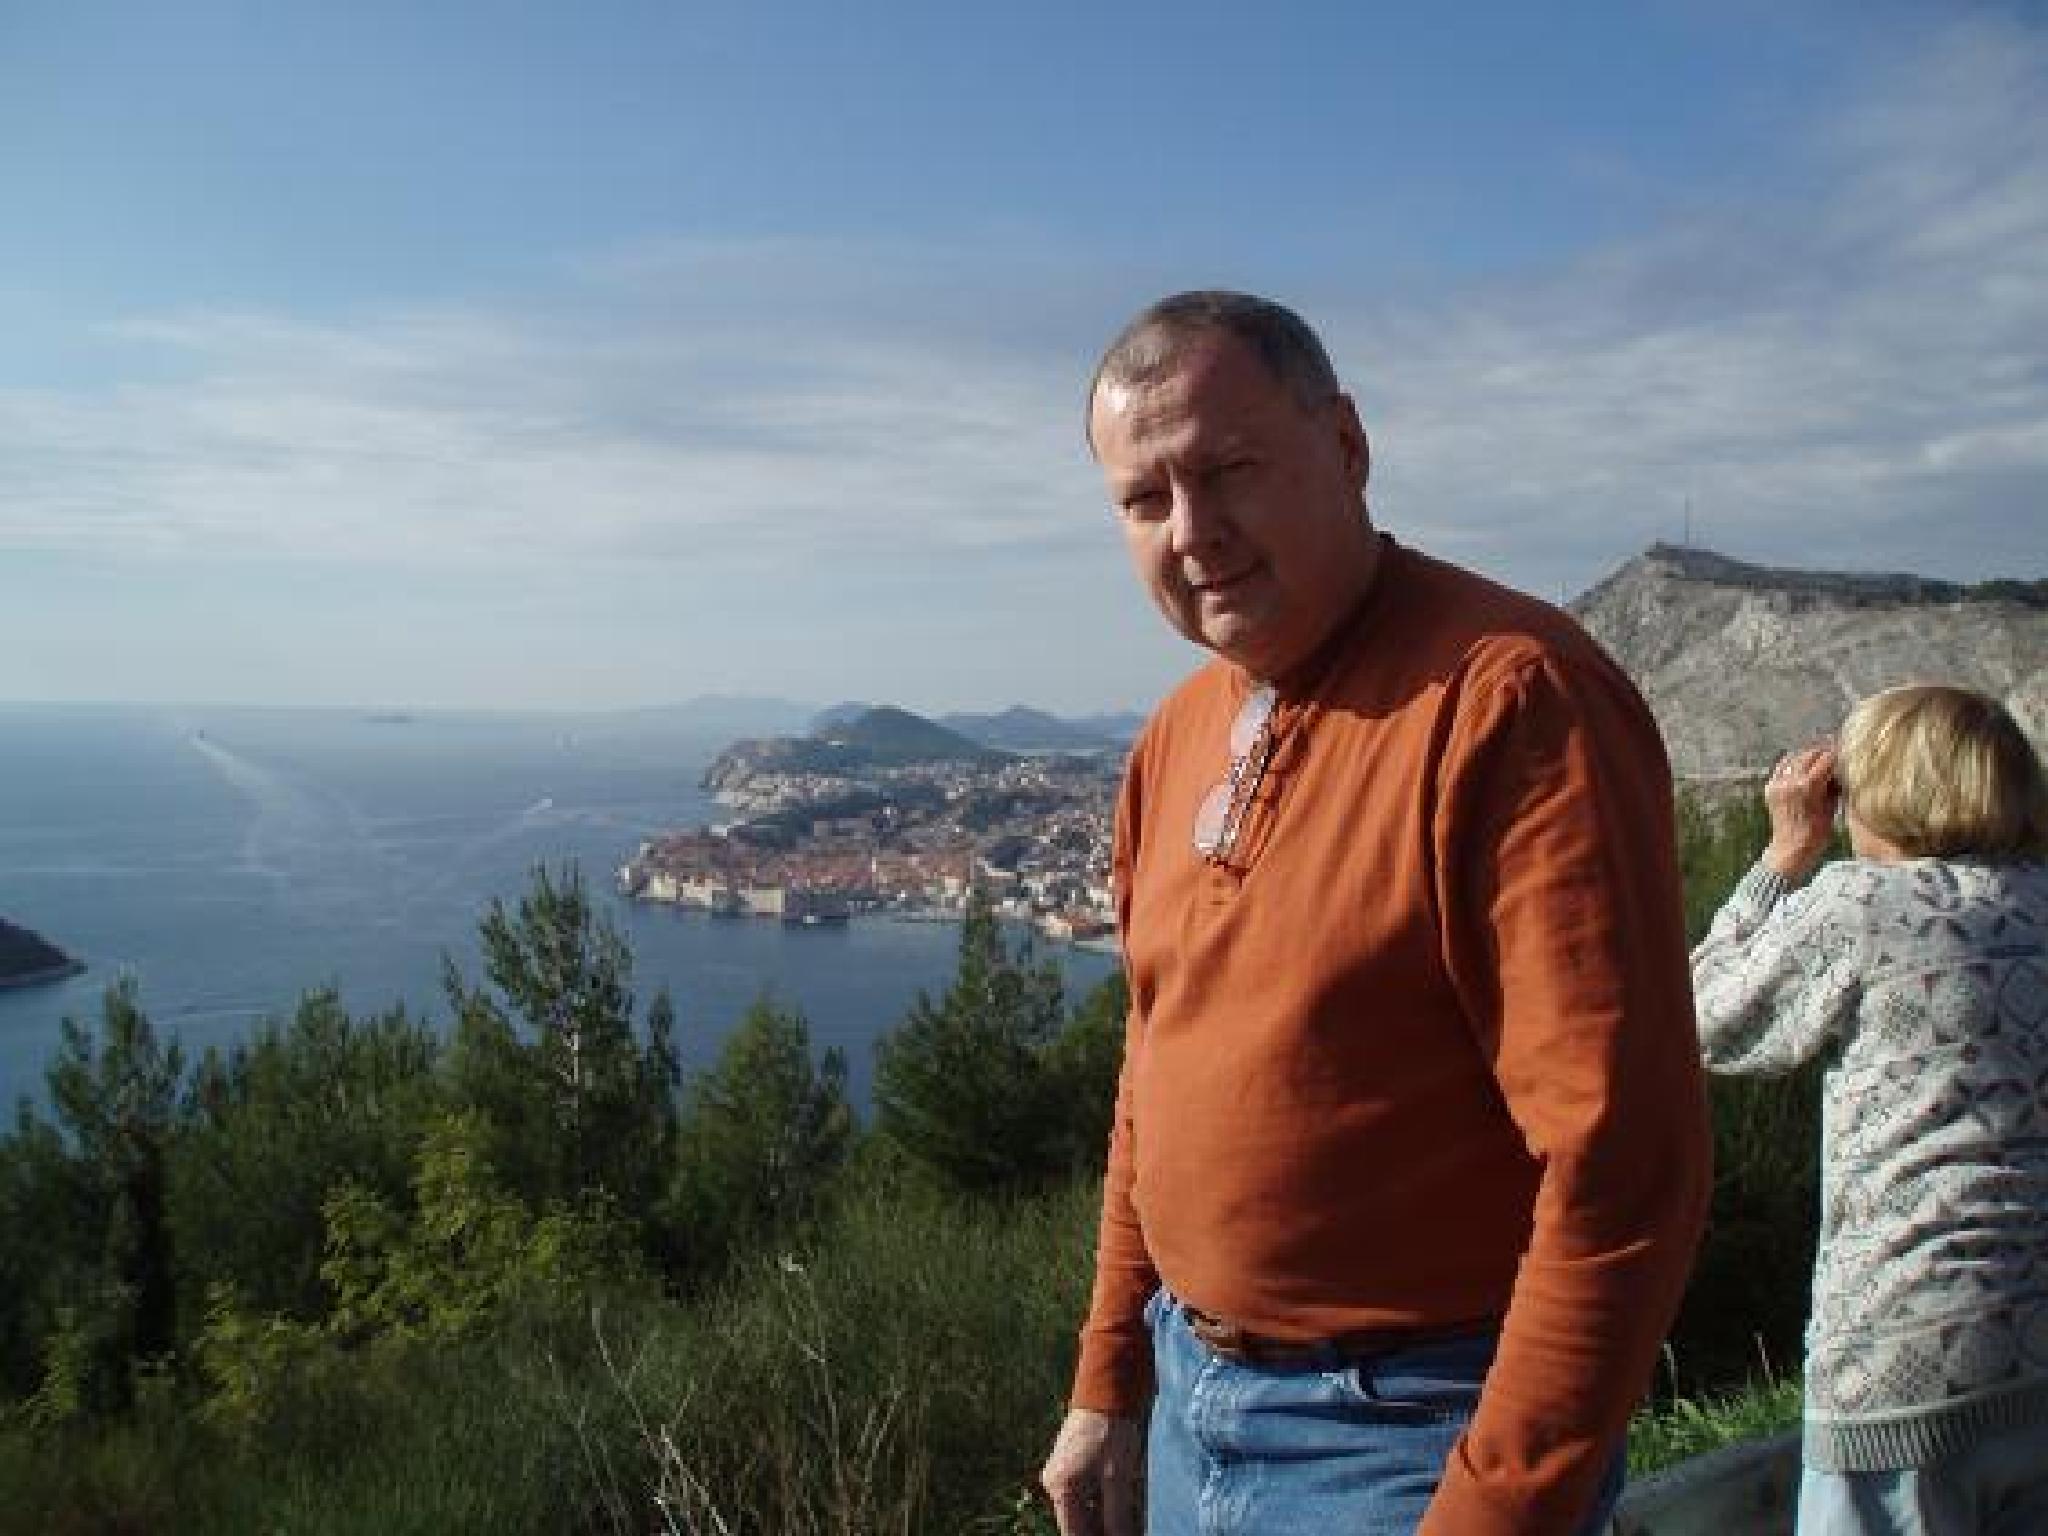 Dubrovnik, Croatia by Roger Courtney Sr